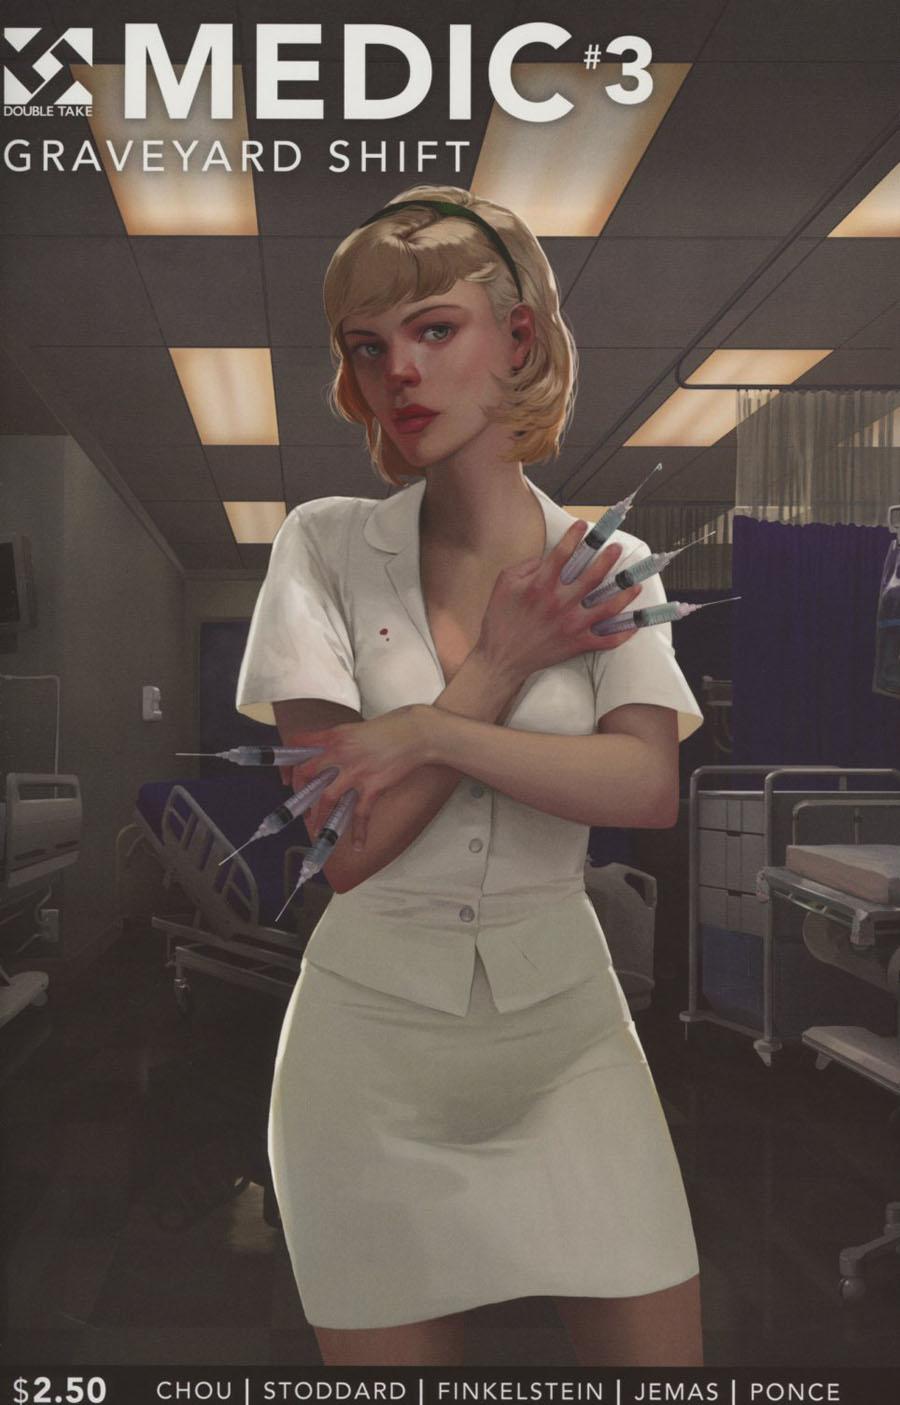 Medic #3